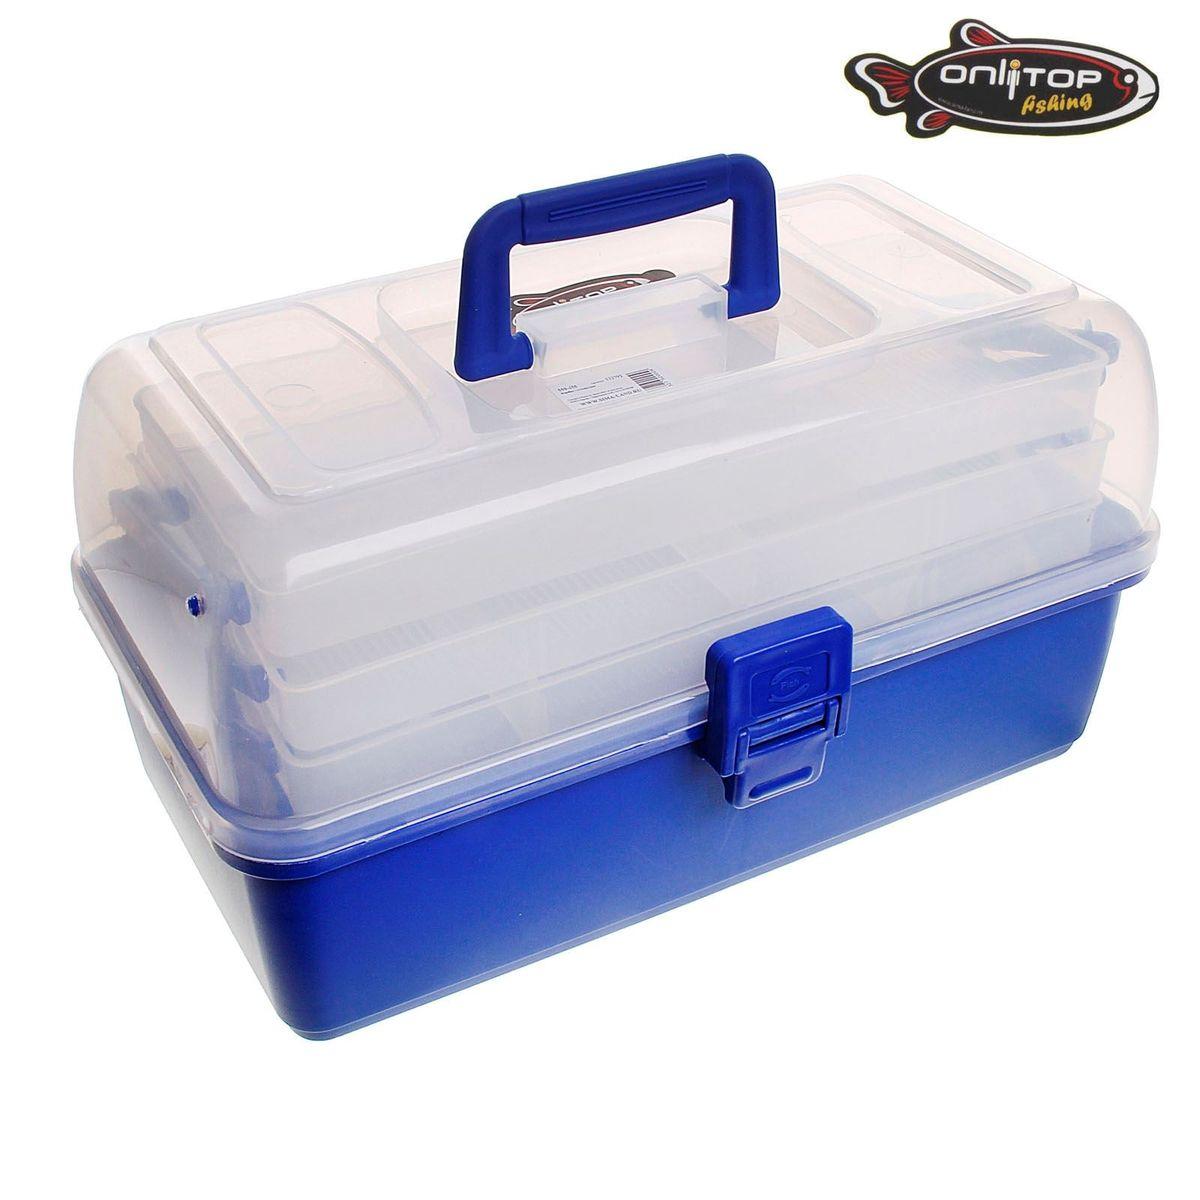 "Коробка для крючков и насадок ""Onlitop"", трехъярусная, цвет: синий, 17 х 34 х 20 см 132792"